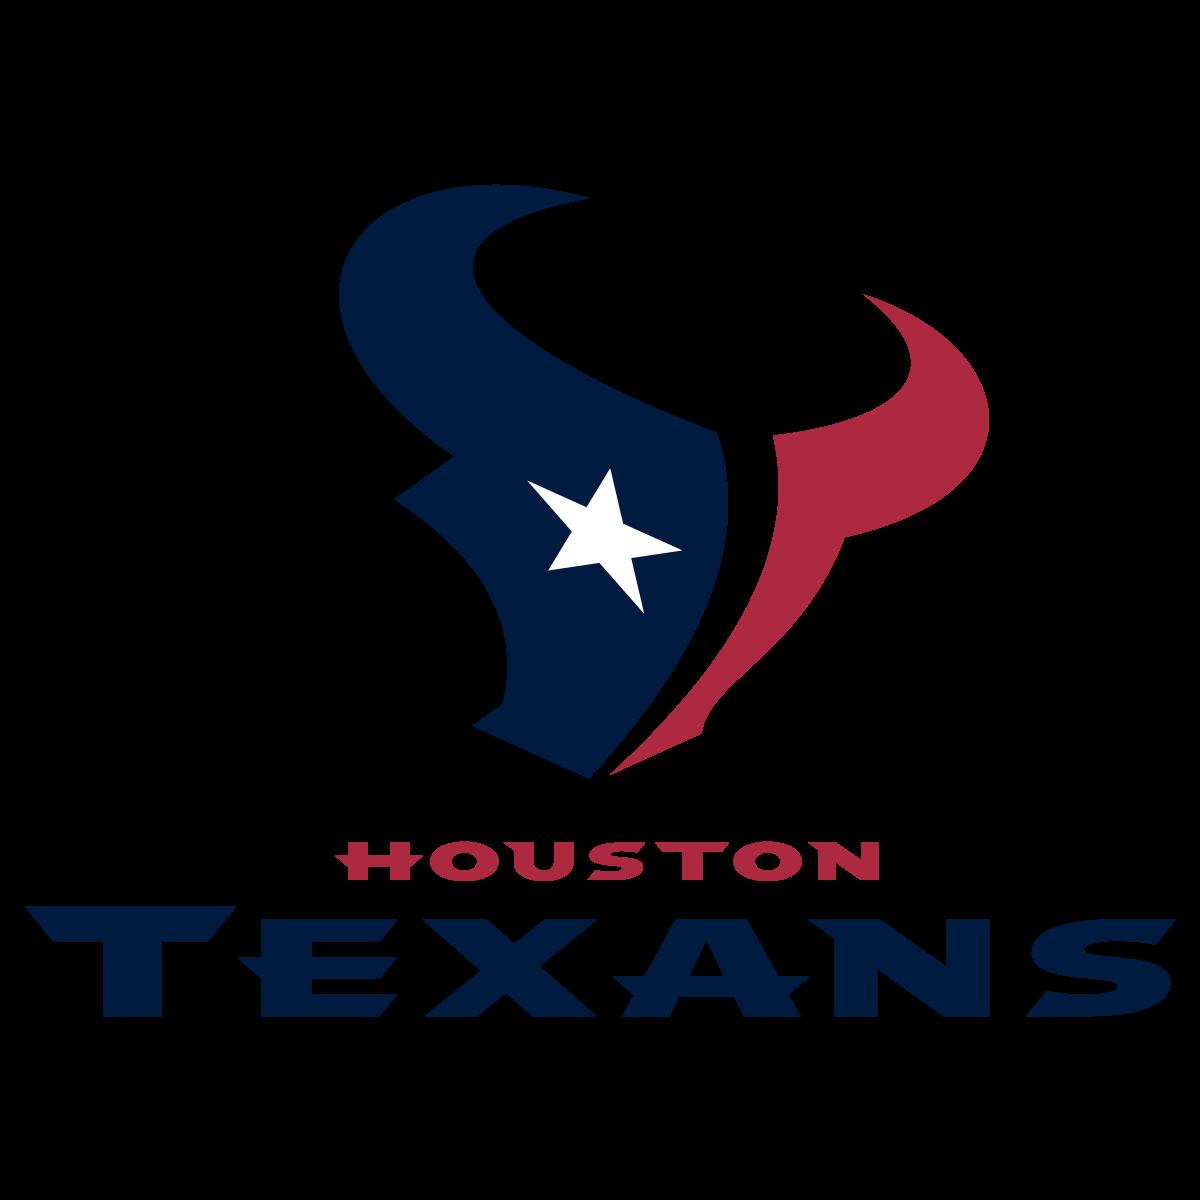 1200x1200 Houston Texans American Football Team Logo Vector Free Vector